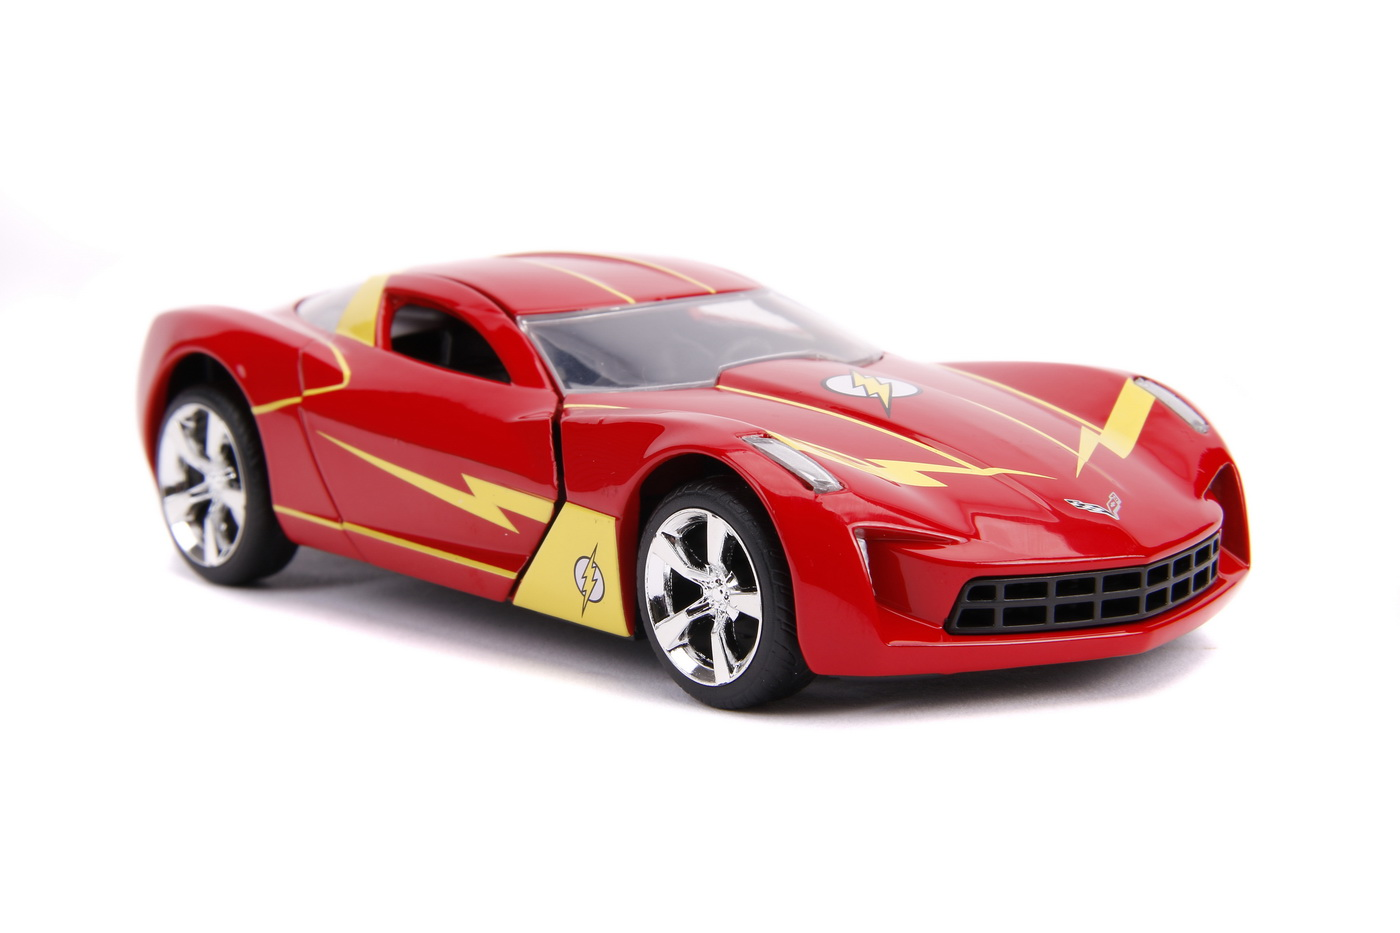 Masinuta Metalica Flash 2009 Chevy Corvette Scara 1 La 32 | JadaToys - 5